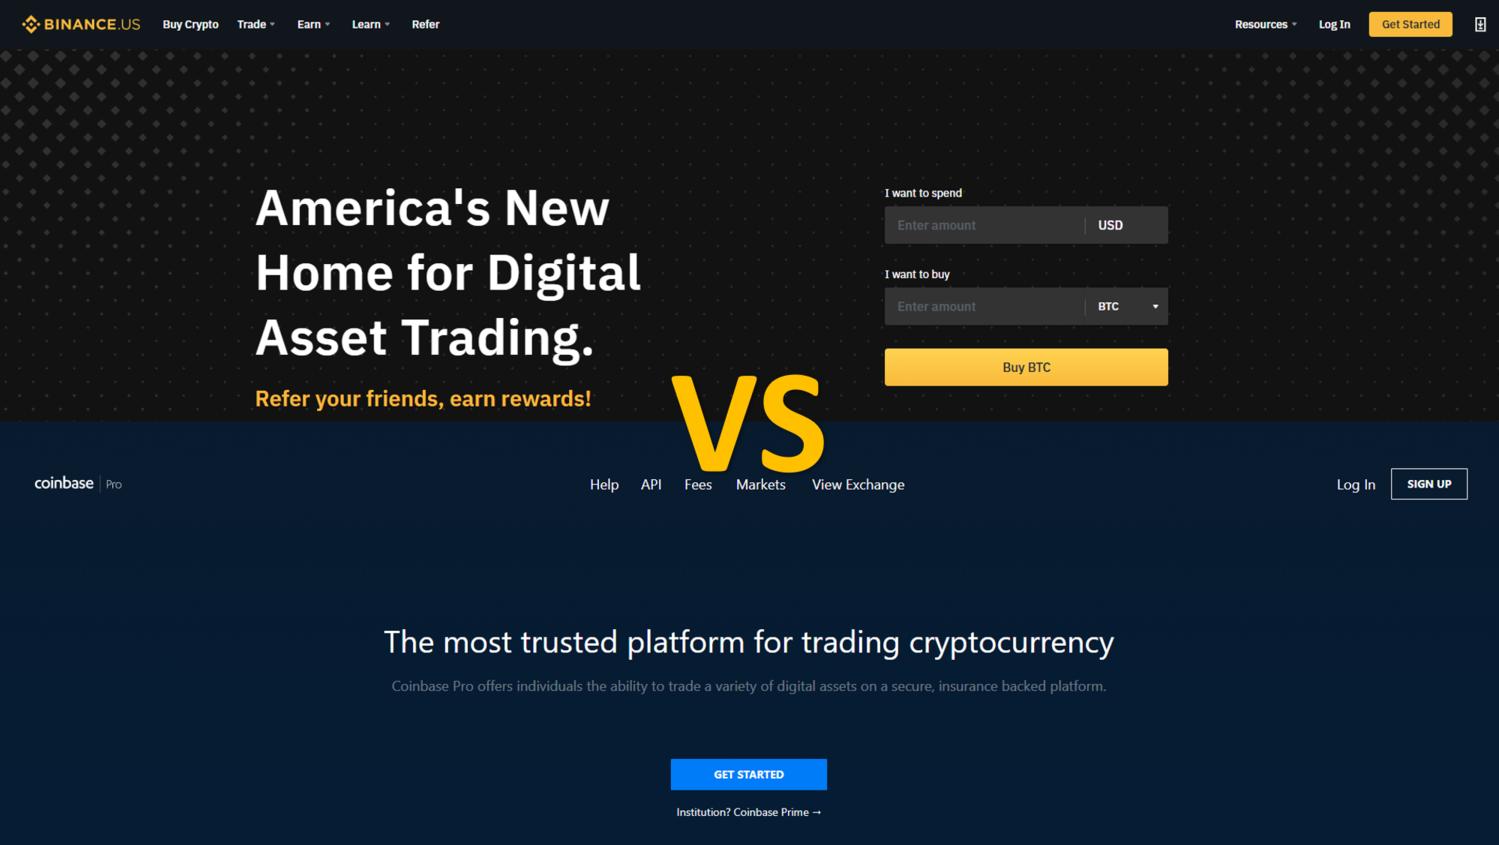 Binance US vs Coinbase Pro